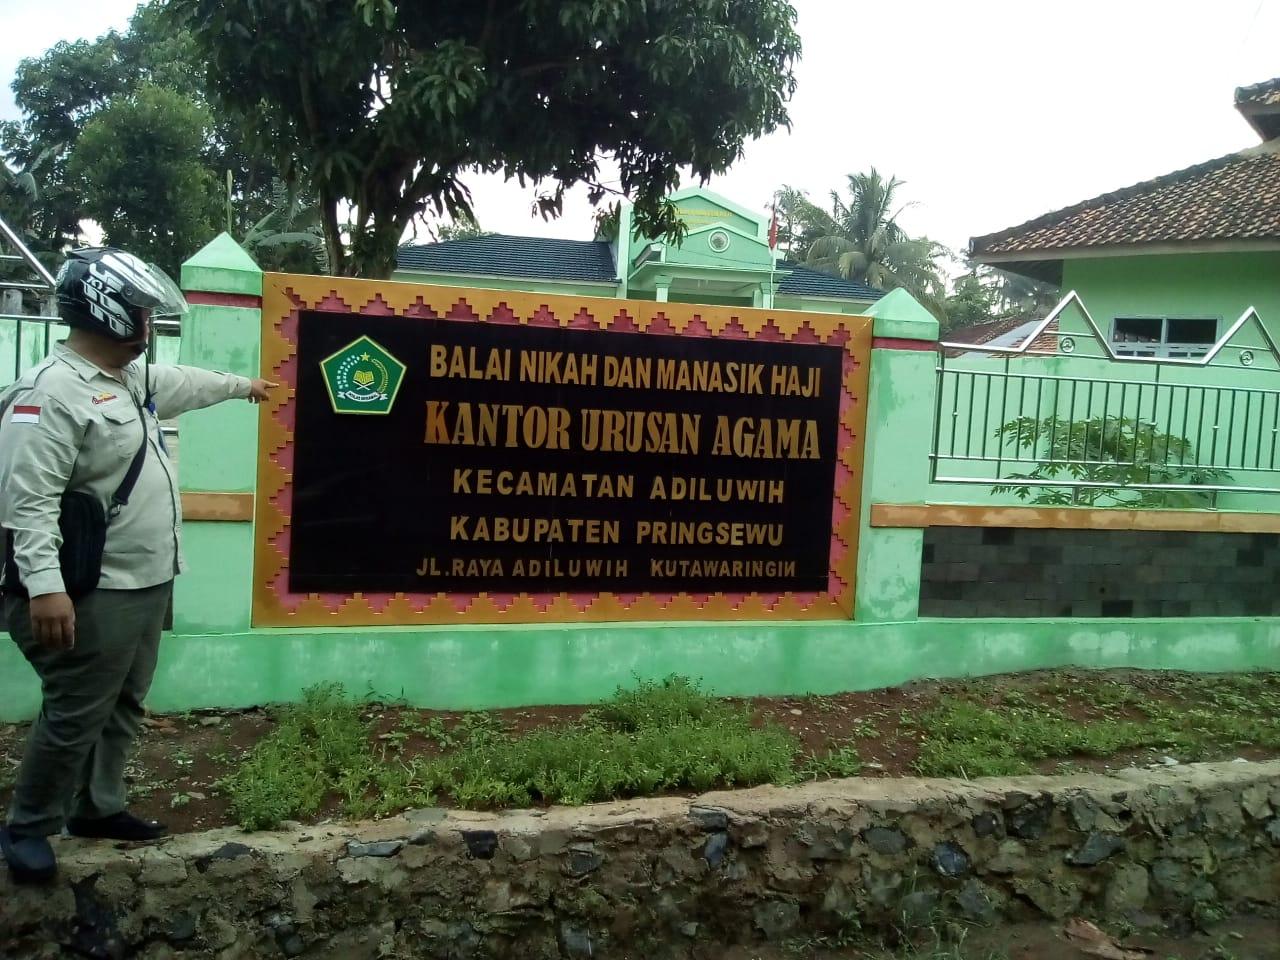 Pembangunan  Balai Nikah dan Manasik Haji Rampung,  Namun Upah Pekerja Belum dibayar